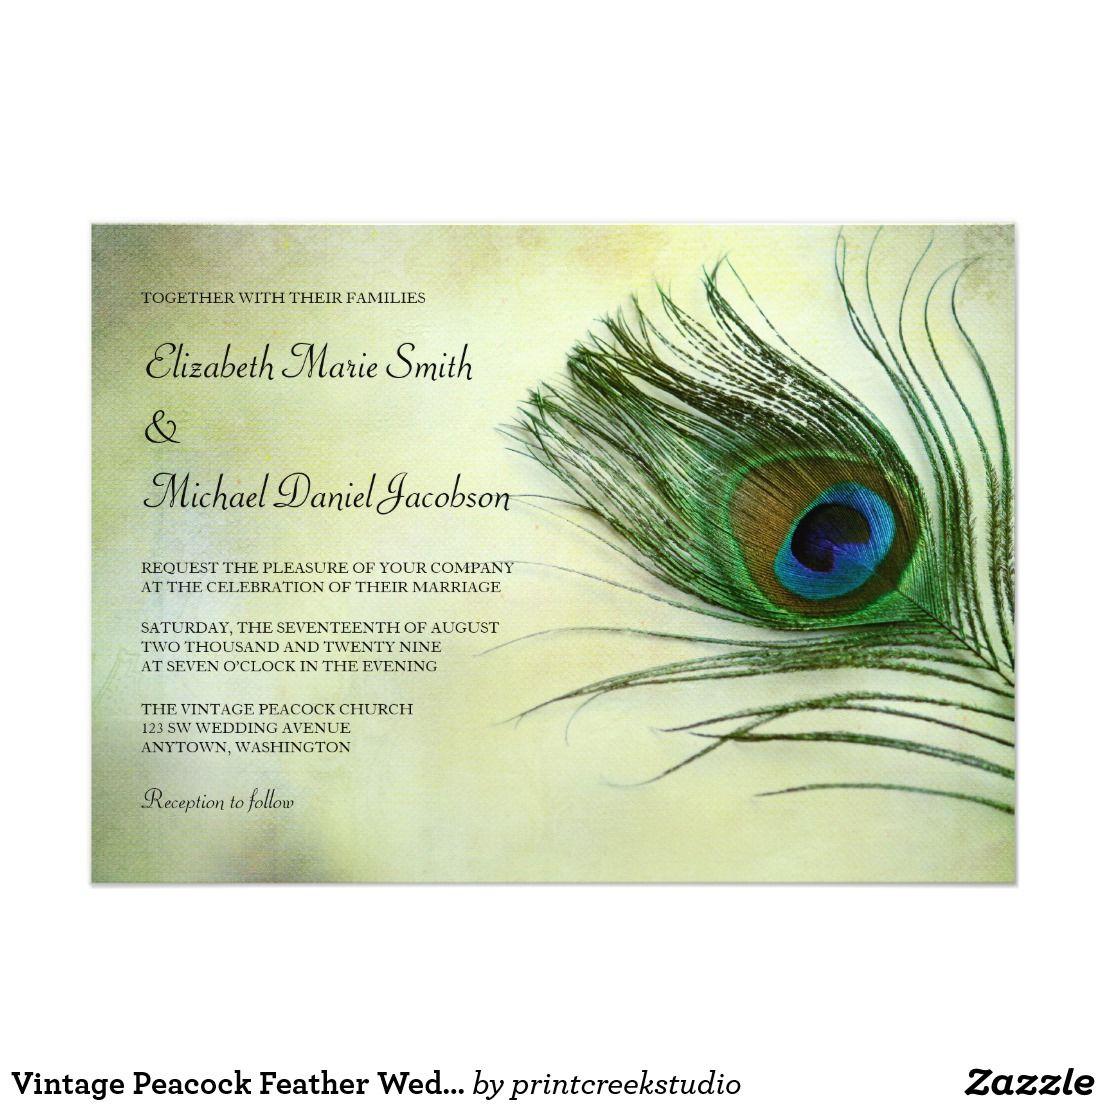 Vintage Peacock Feather Wedding Invitations